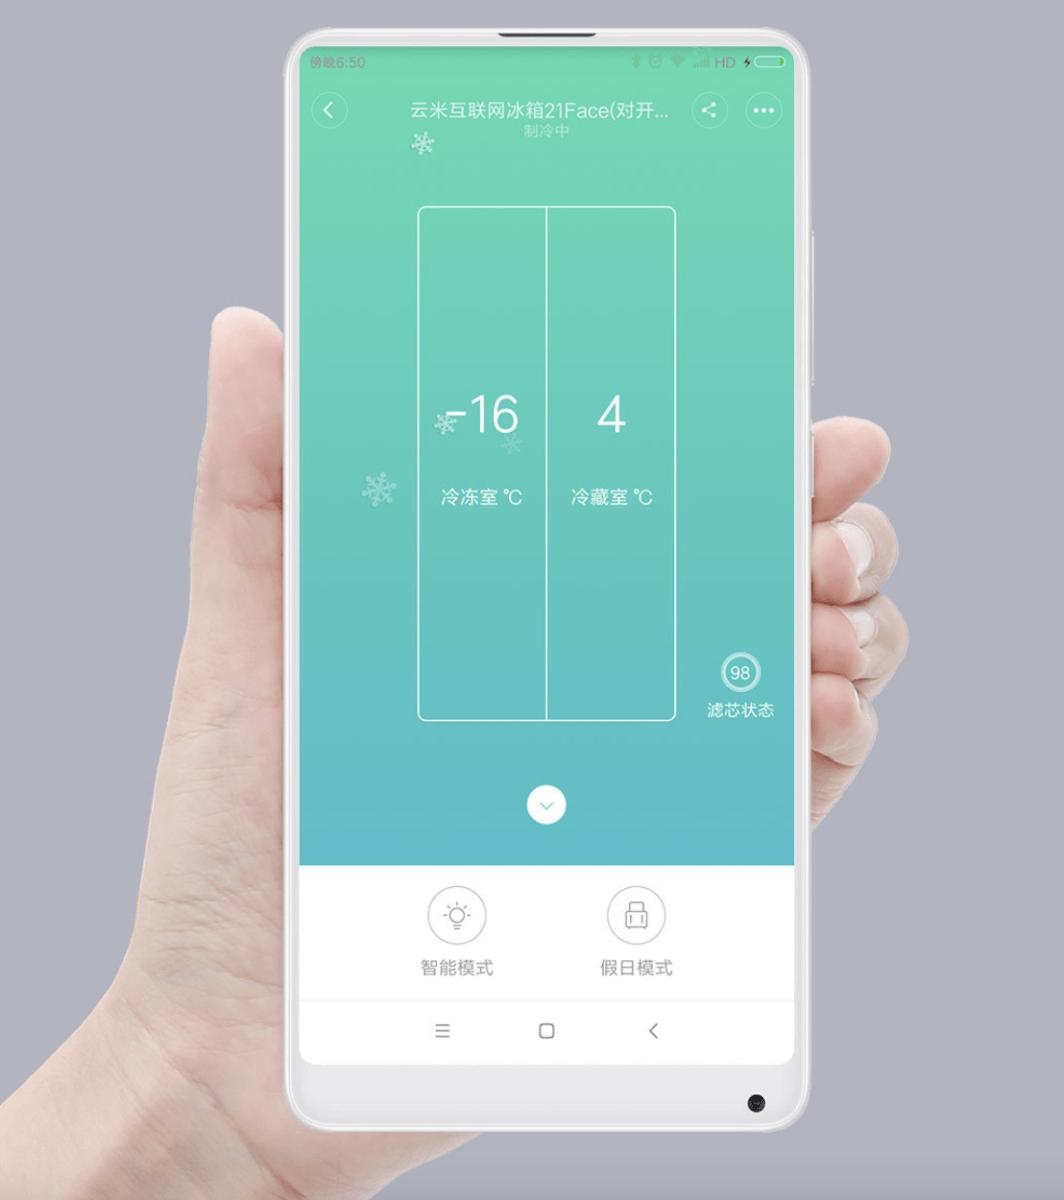 Điều khiển Tủ lạnh Xiaomi Viomi từ xa qua app